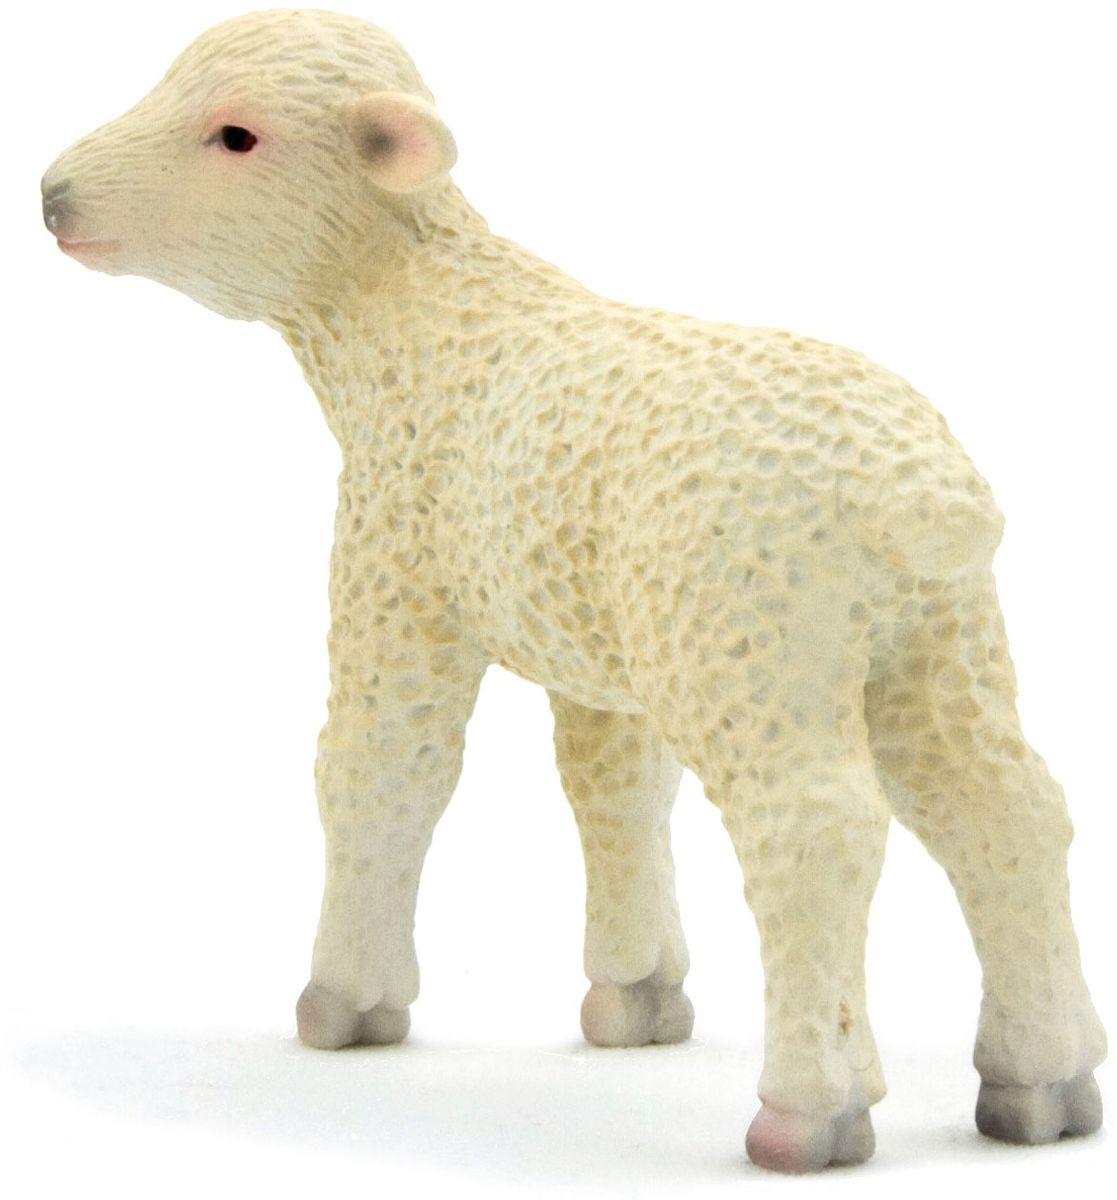 Mojo Фигурка Ягненок S mojo фигурка белый полярный медвежонок в движении